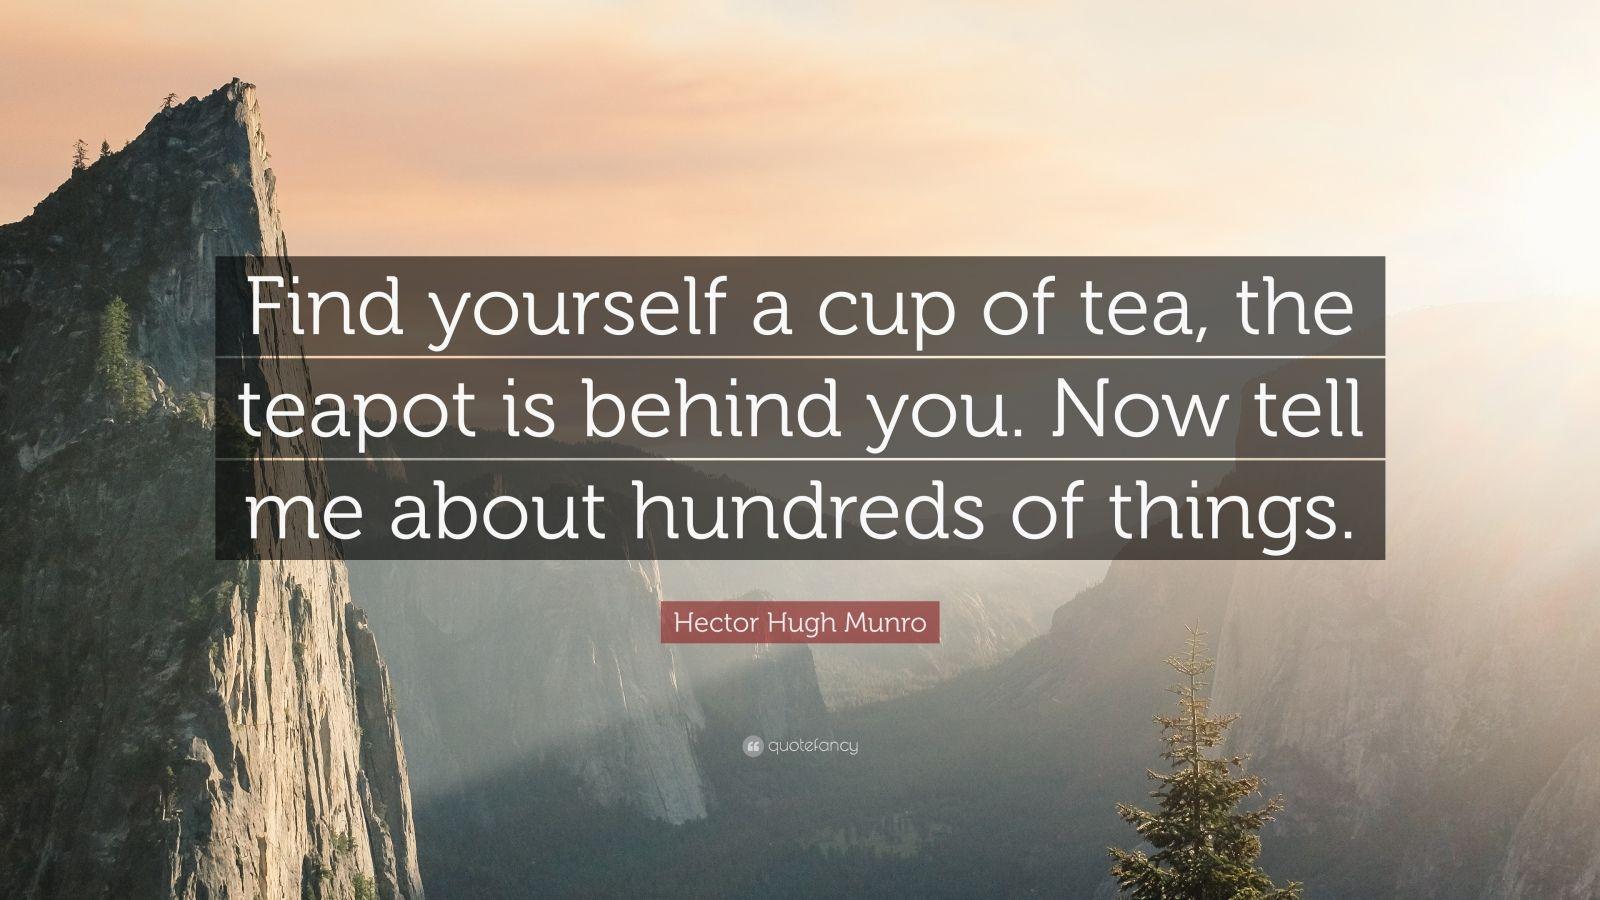 Hector hugh munro tea analysis